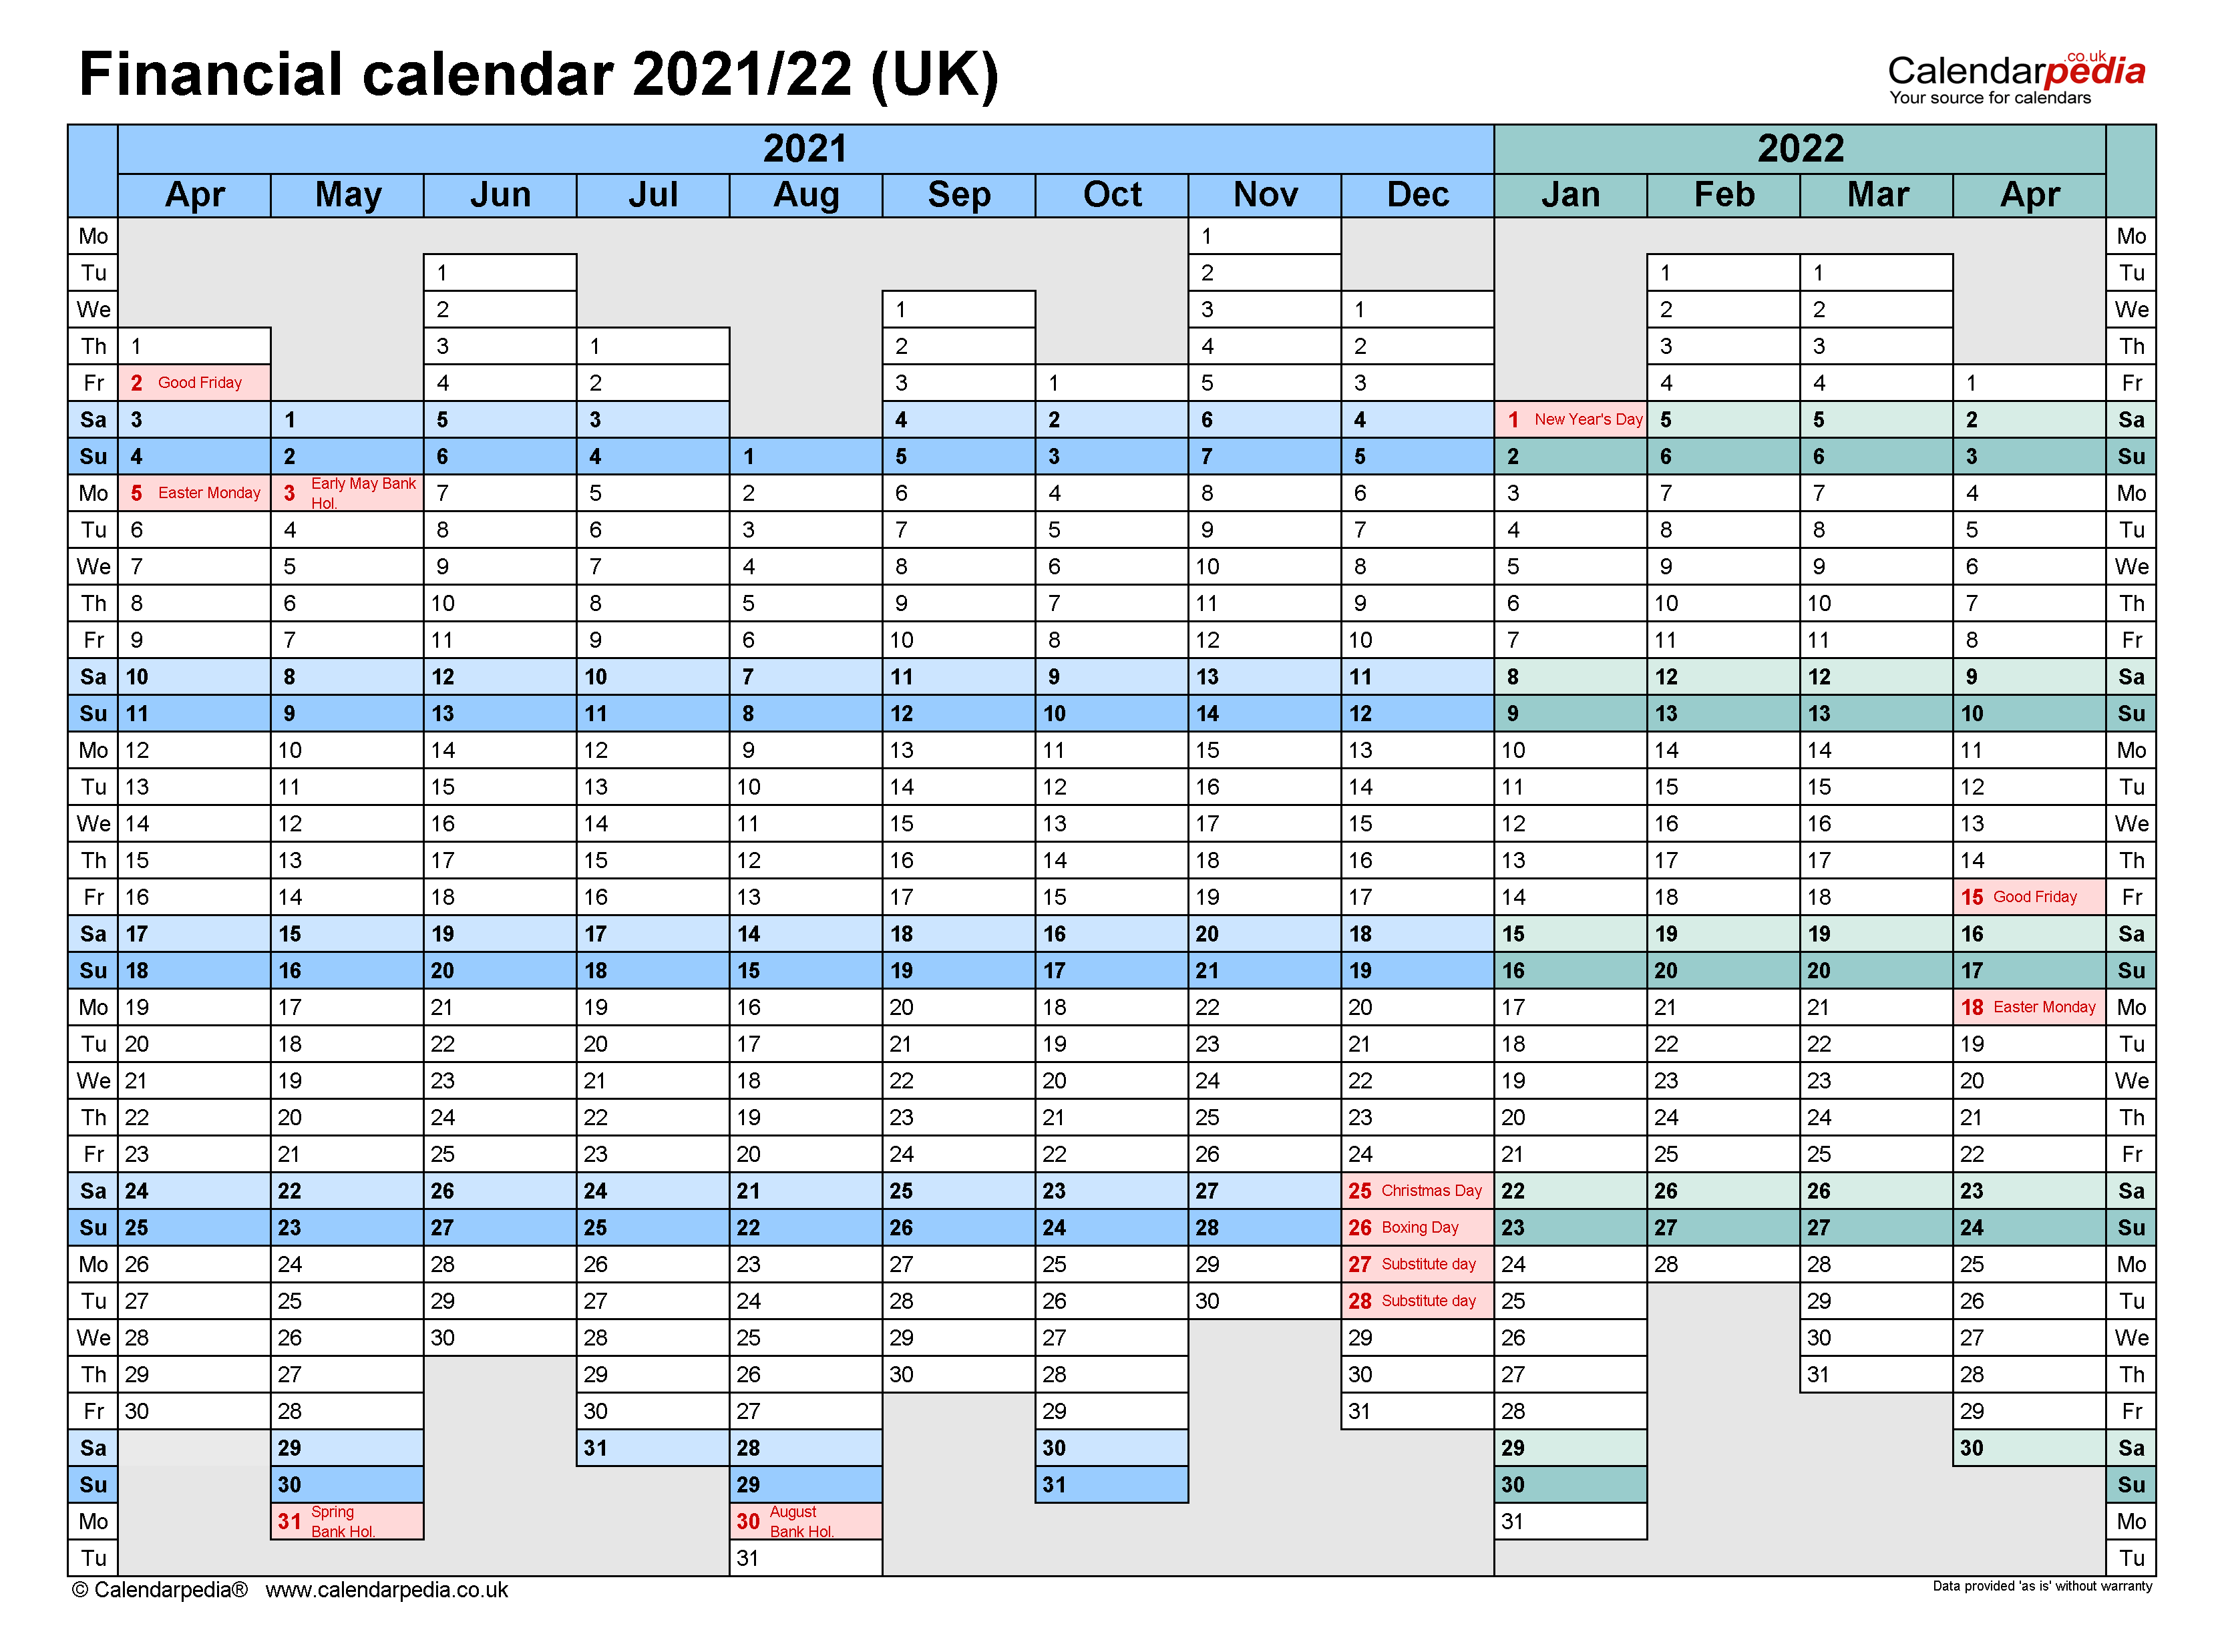 Financial calendars 2021/22 UK in PDF format